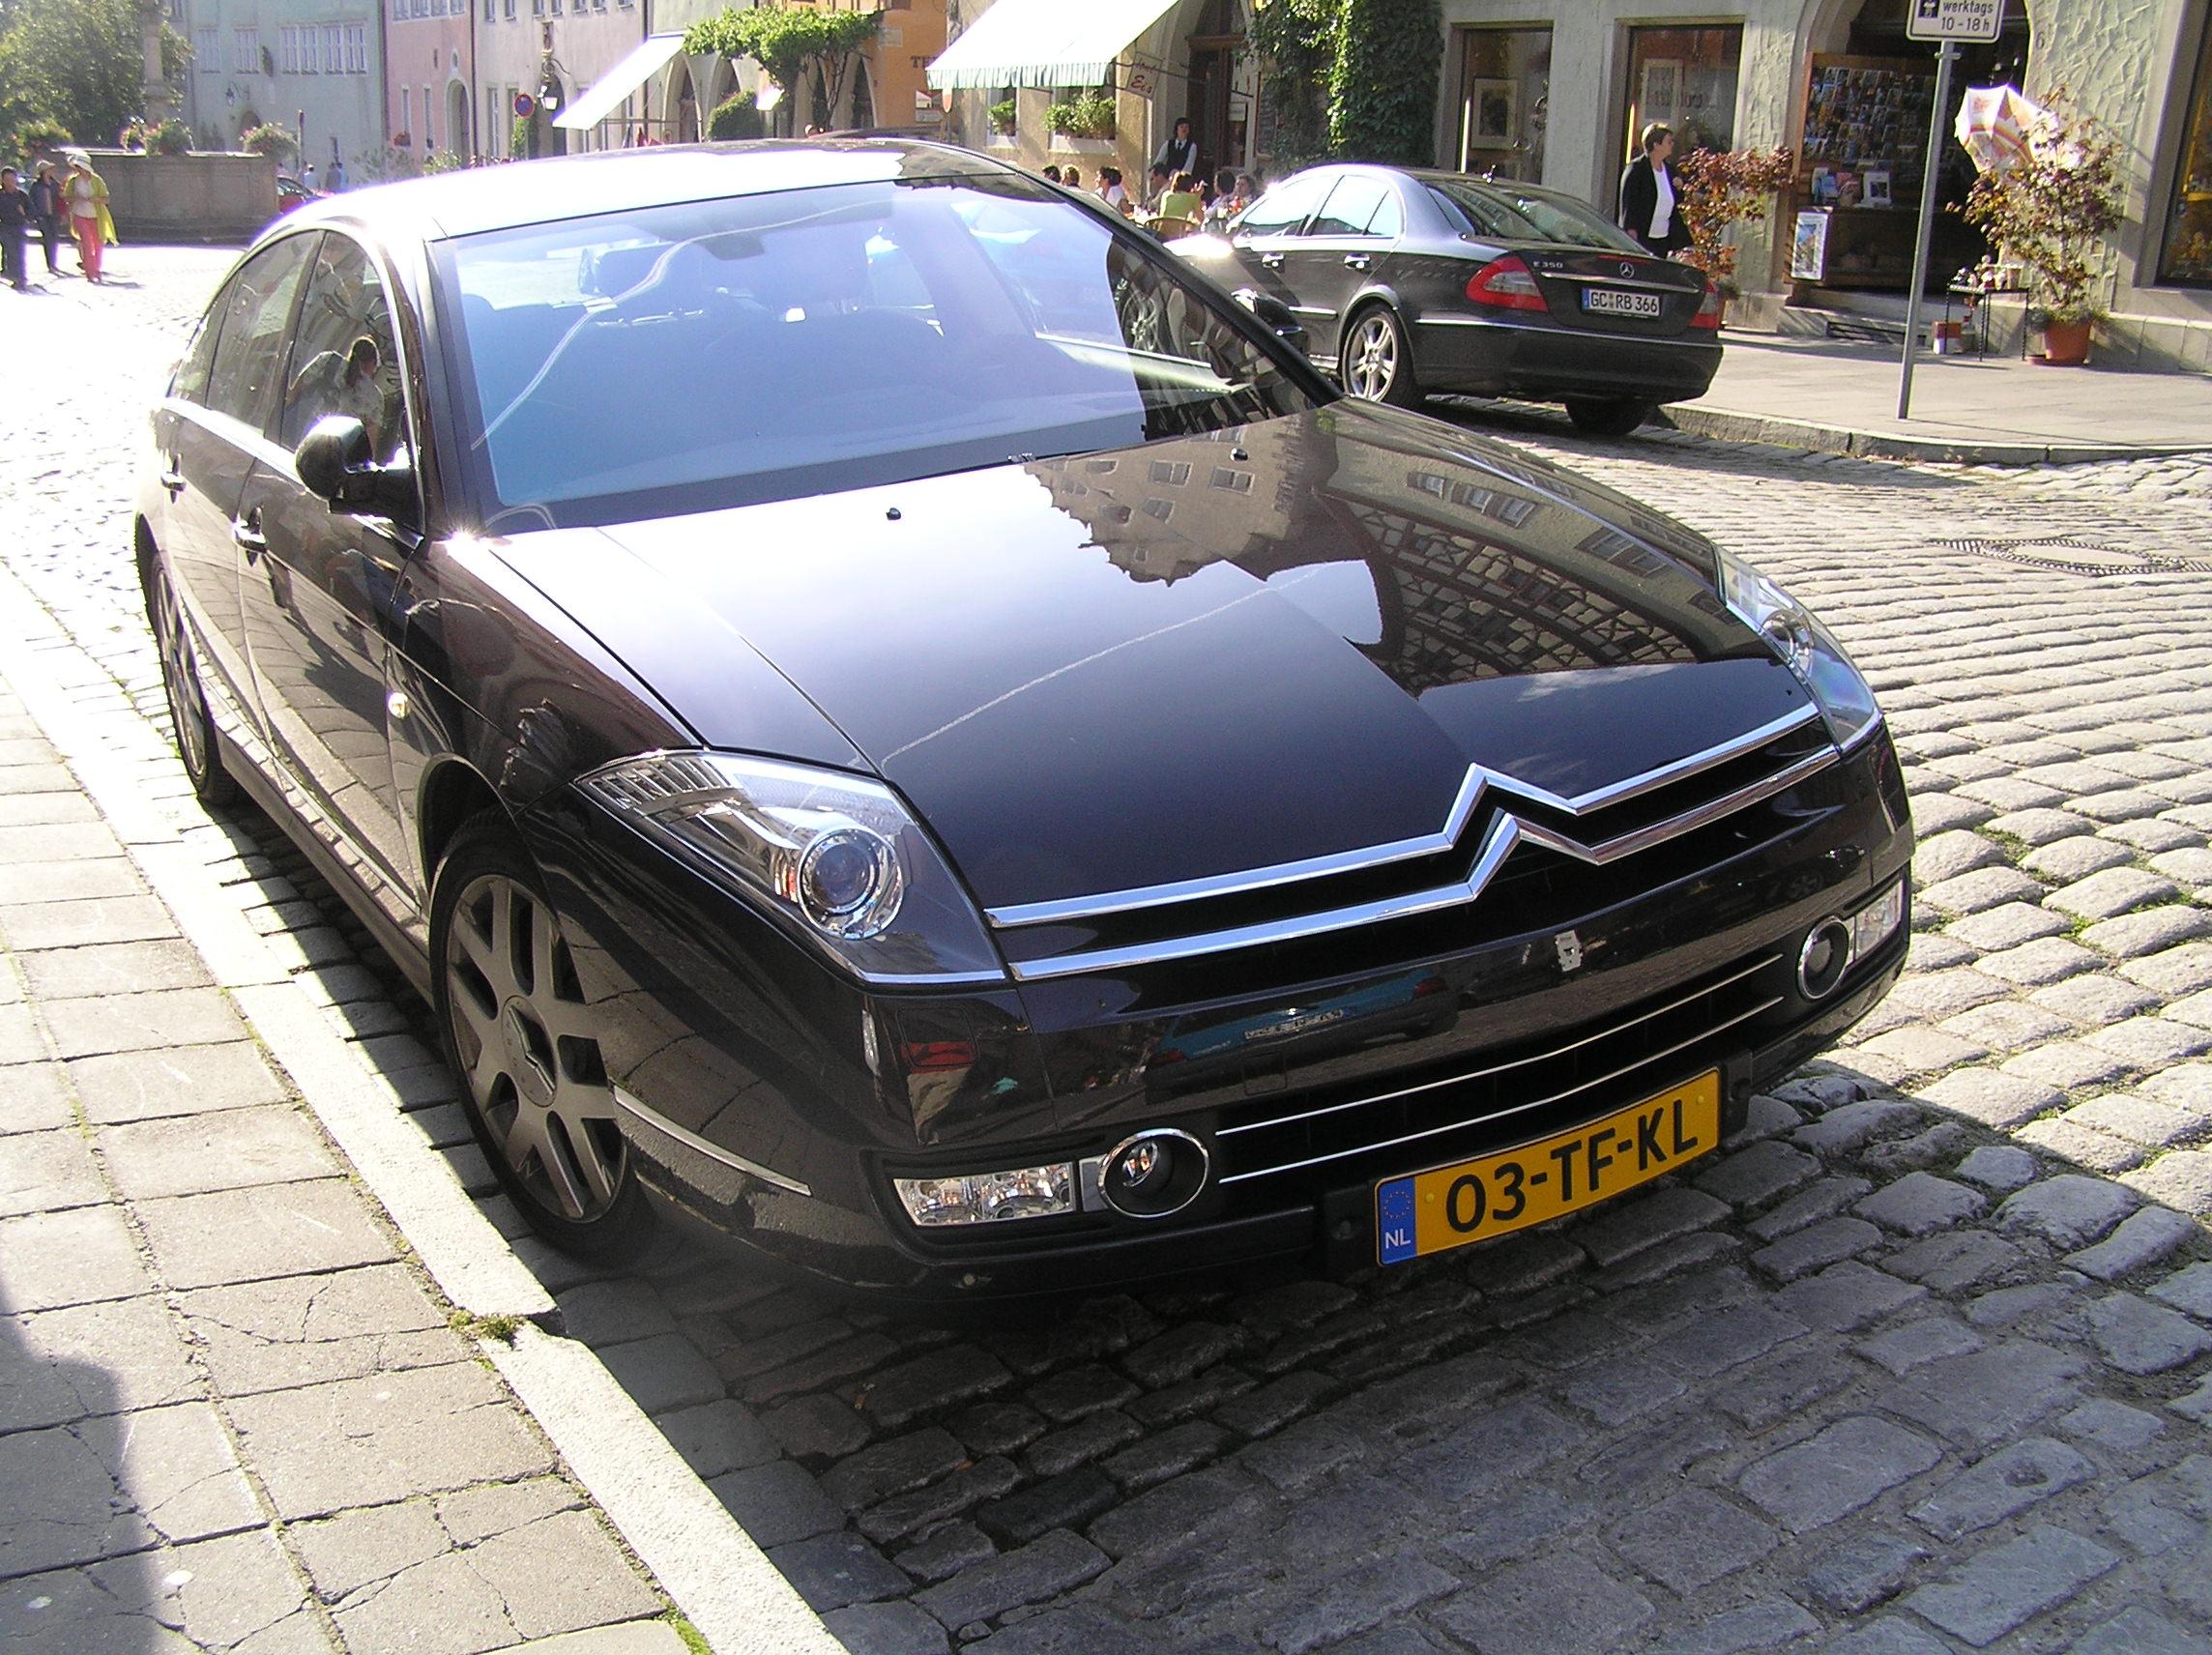 CITROEN C6 black